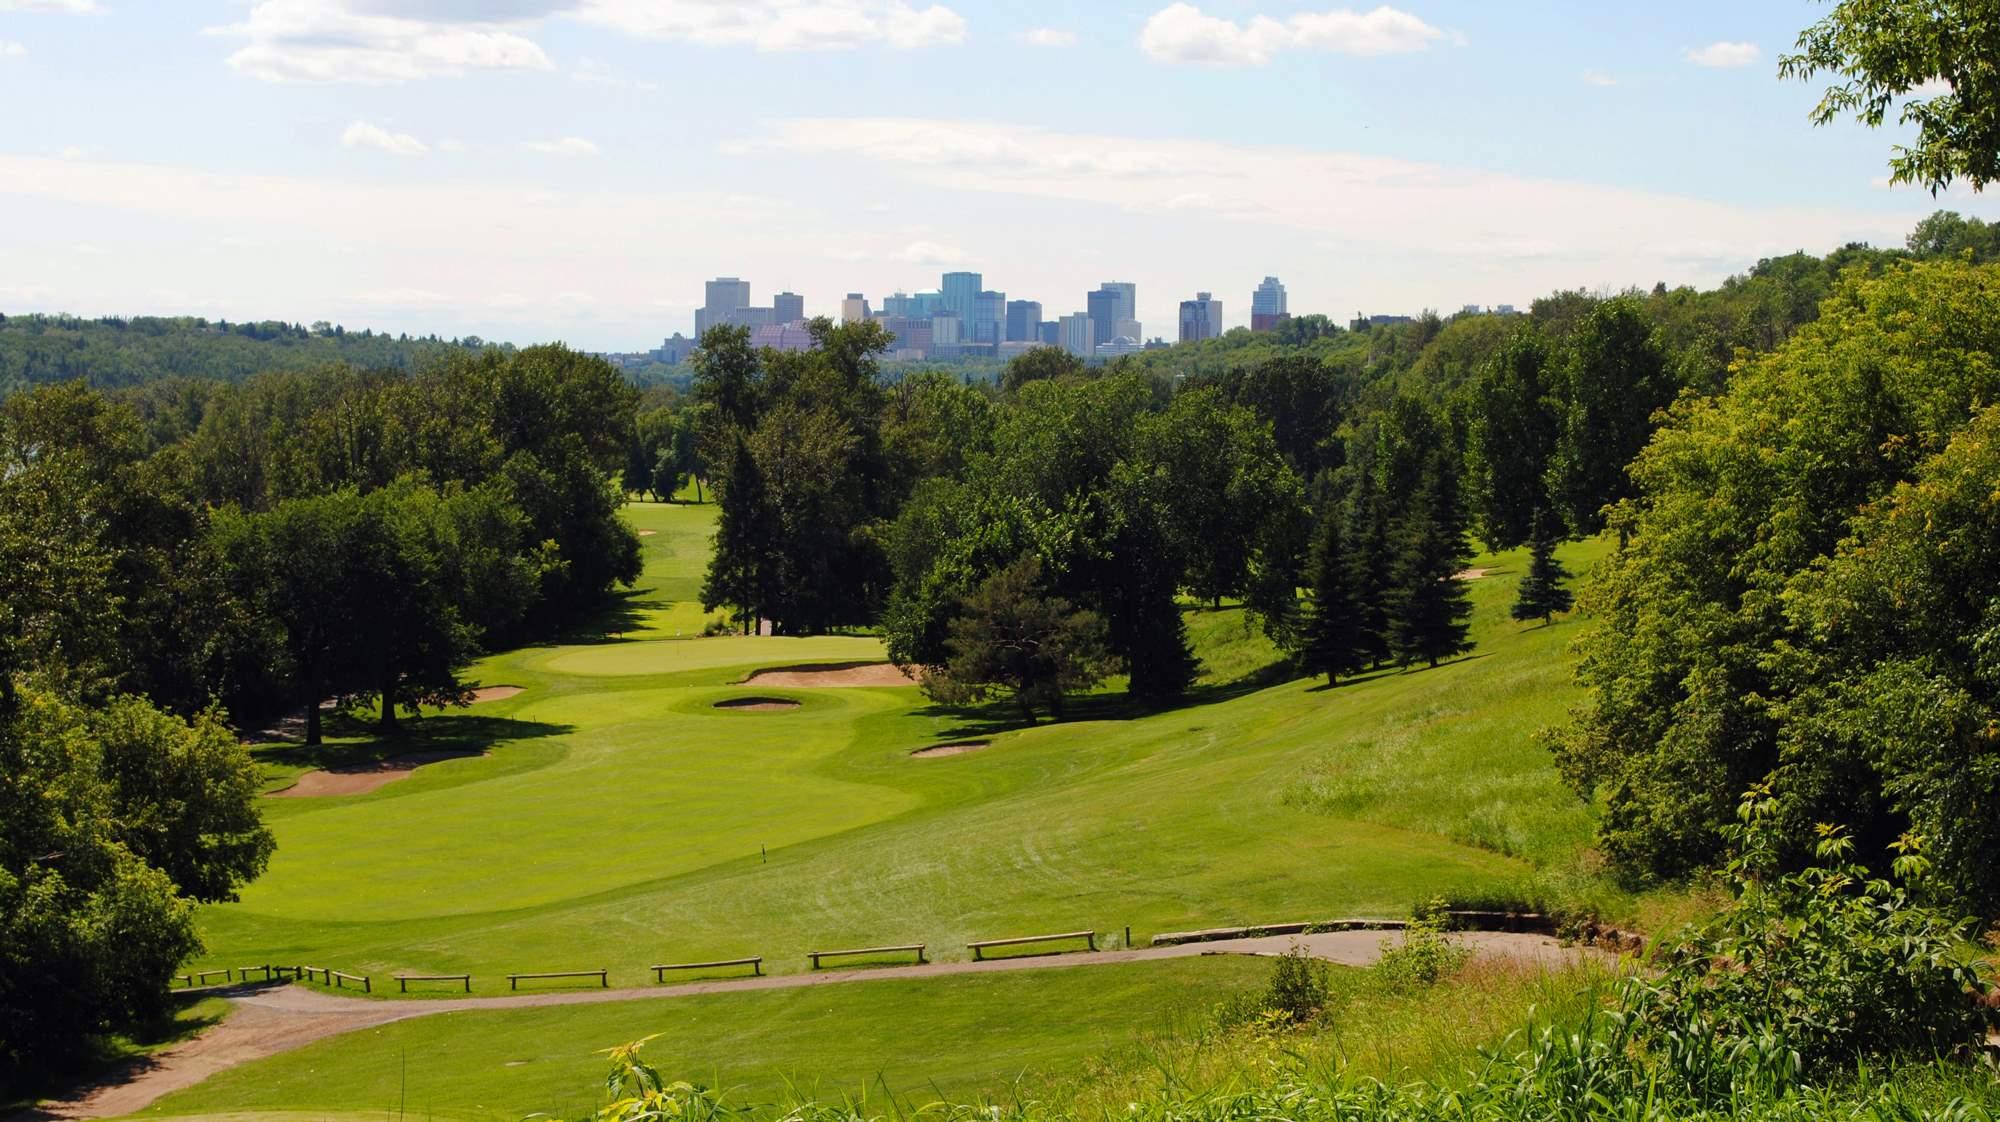 Highlands Golf Club Edmonton Ab Golf Course Information And Reviews